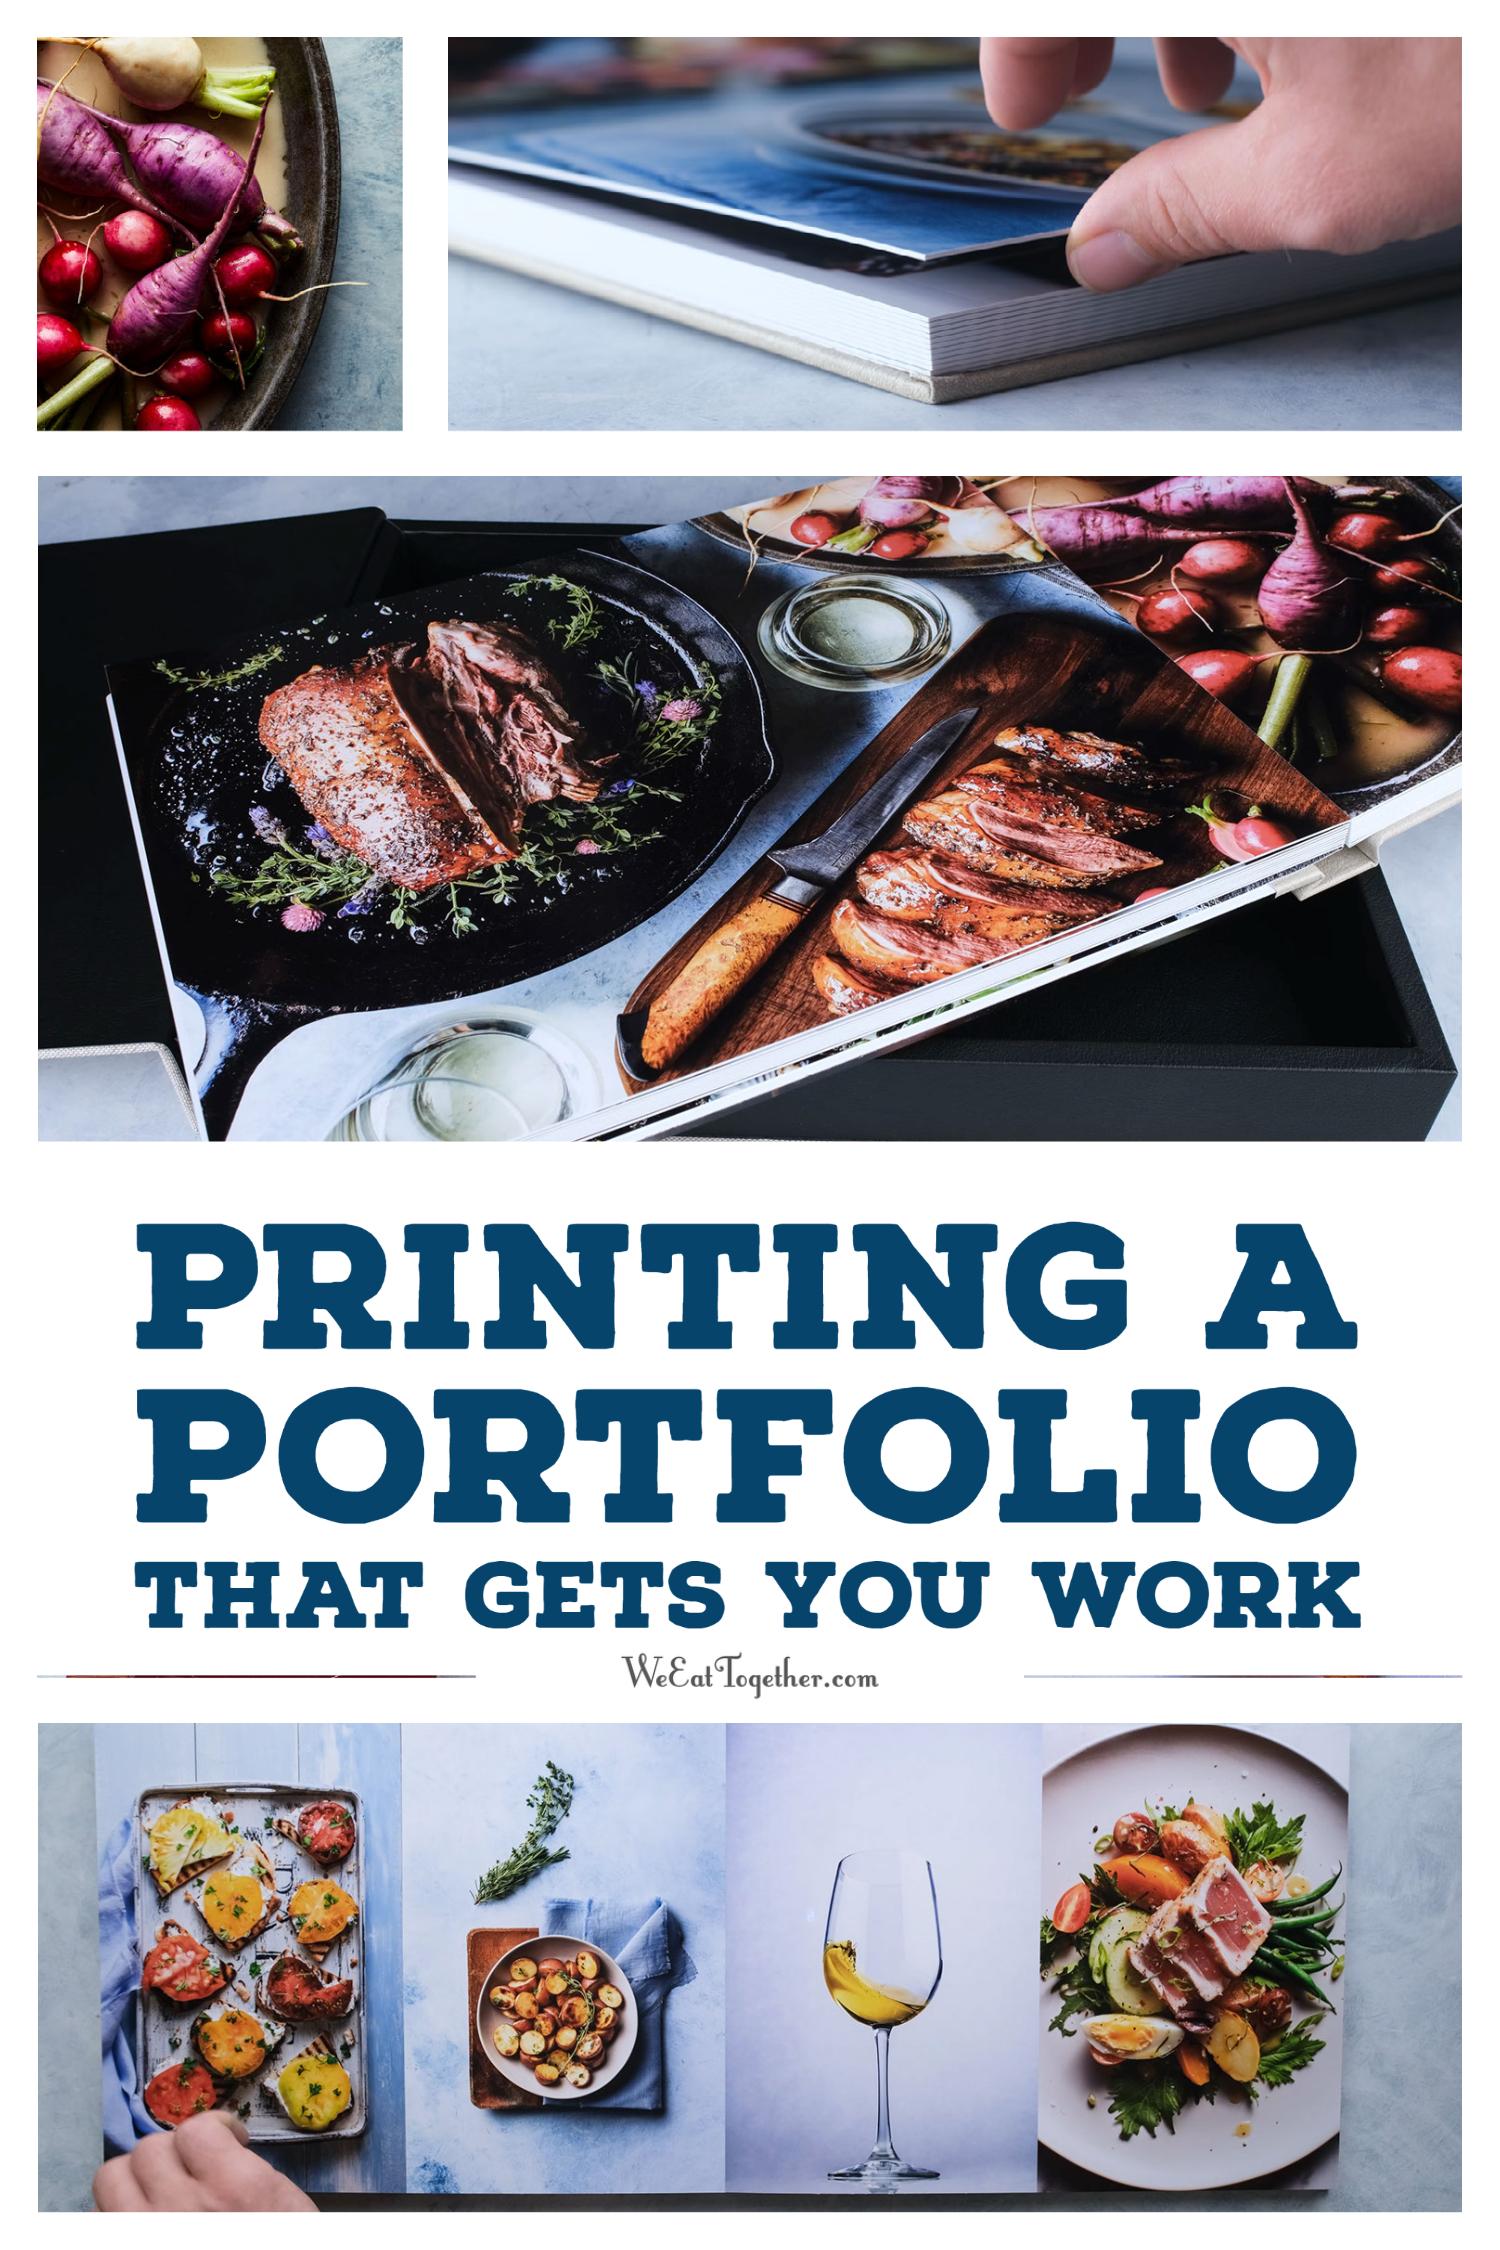 Printing A Portfolio That Gets You Work